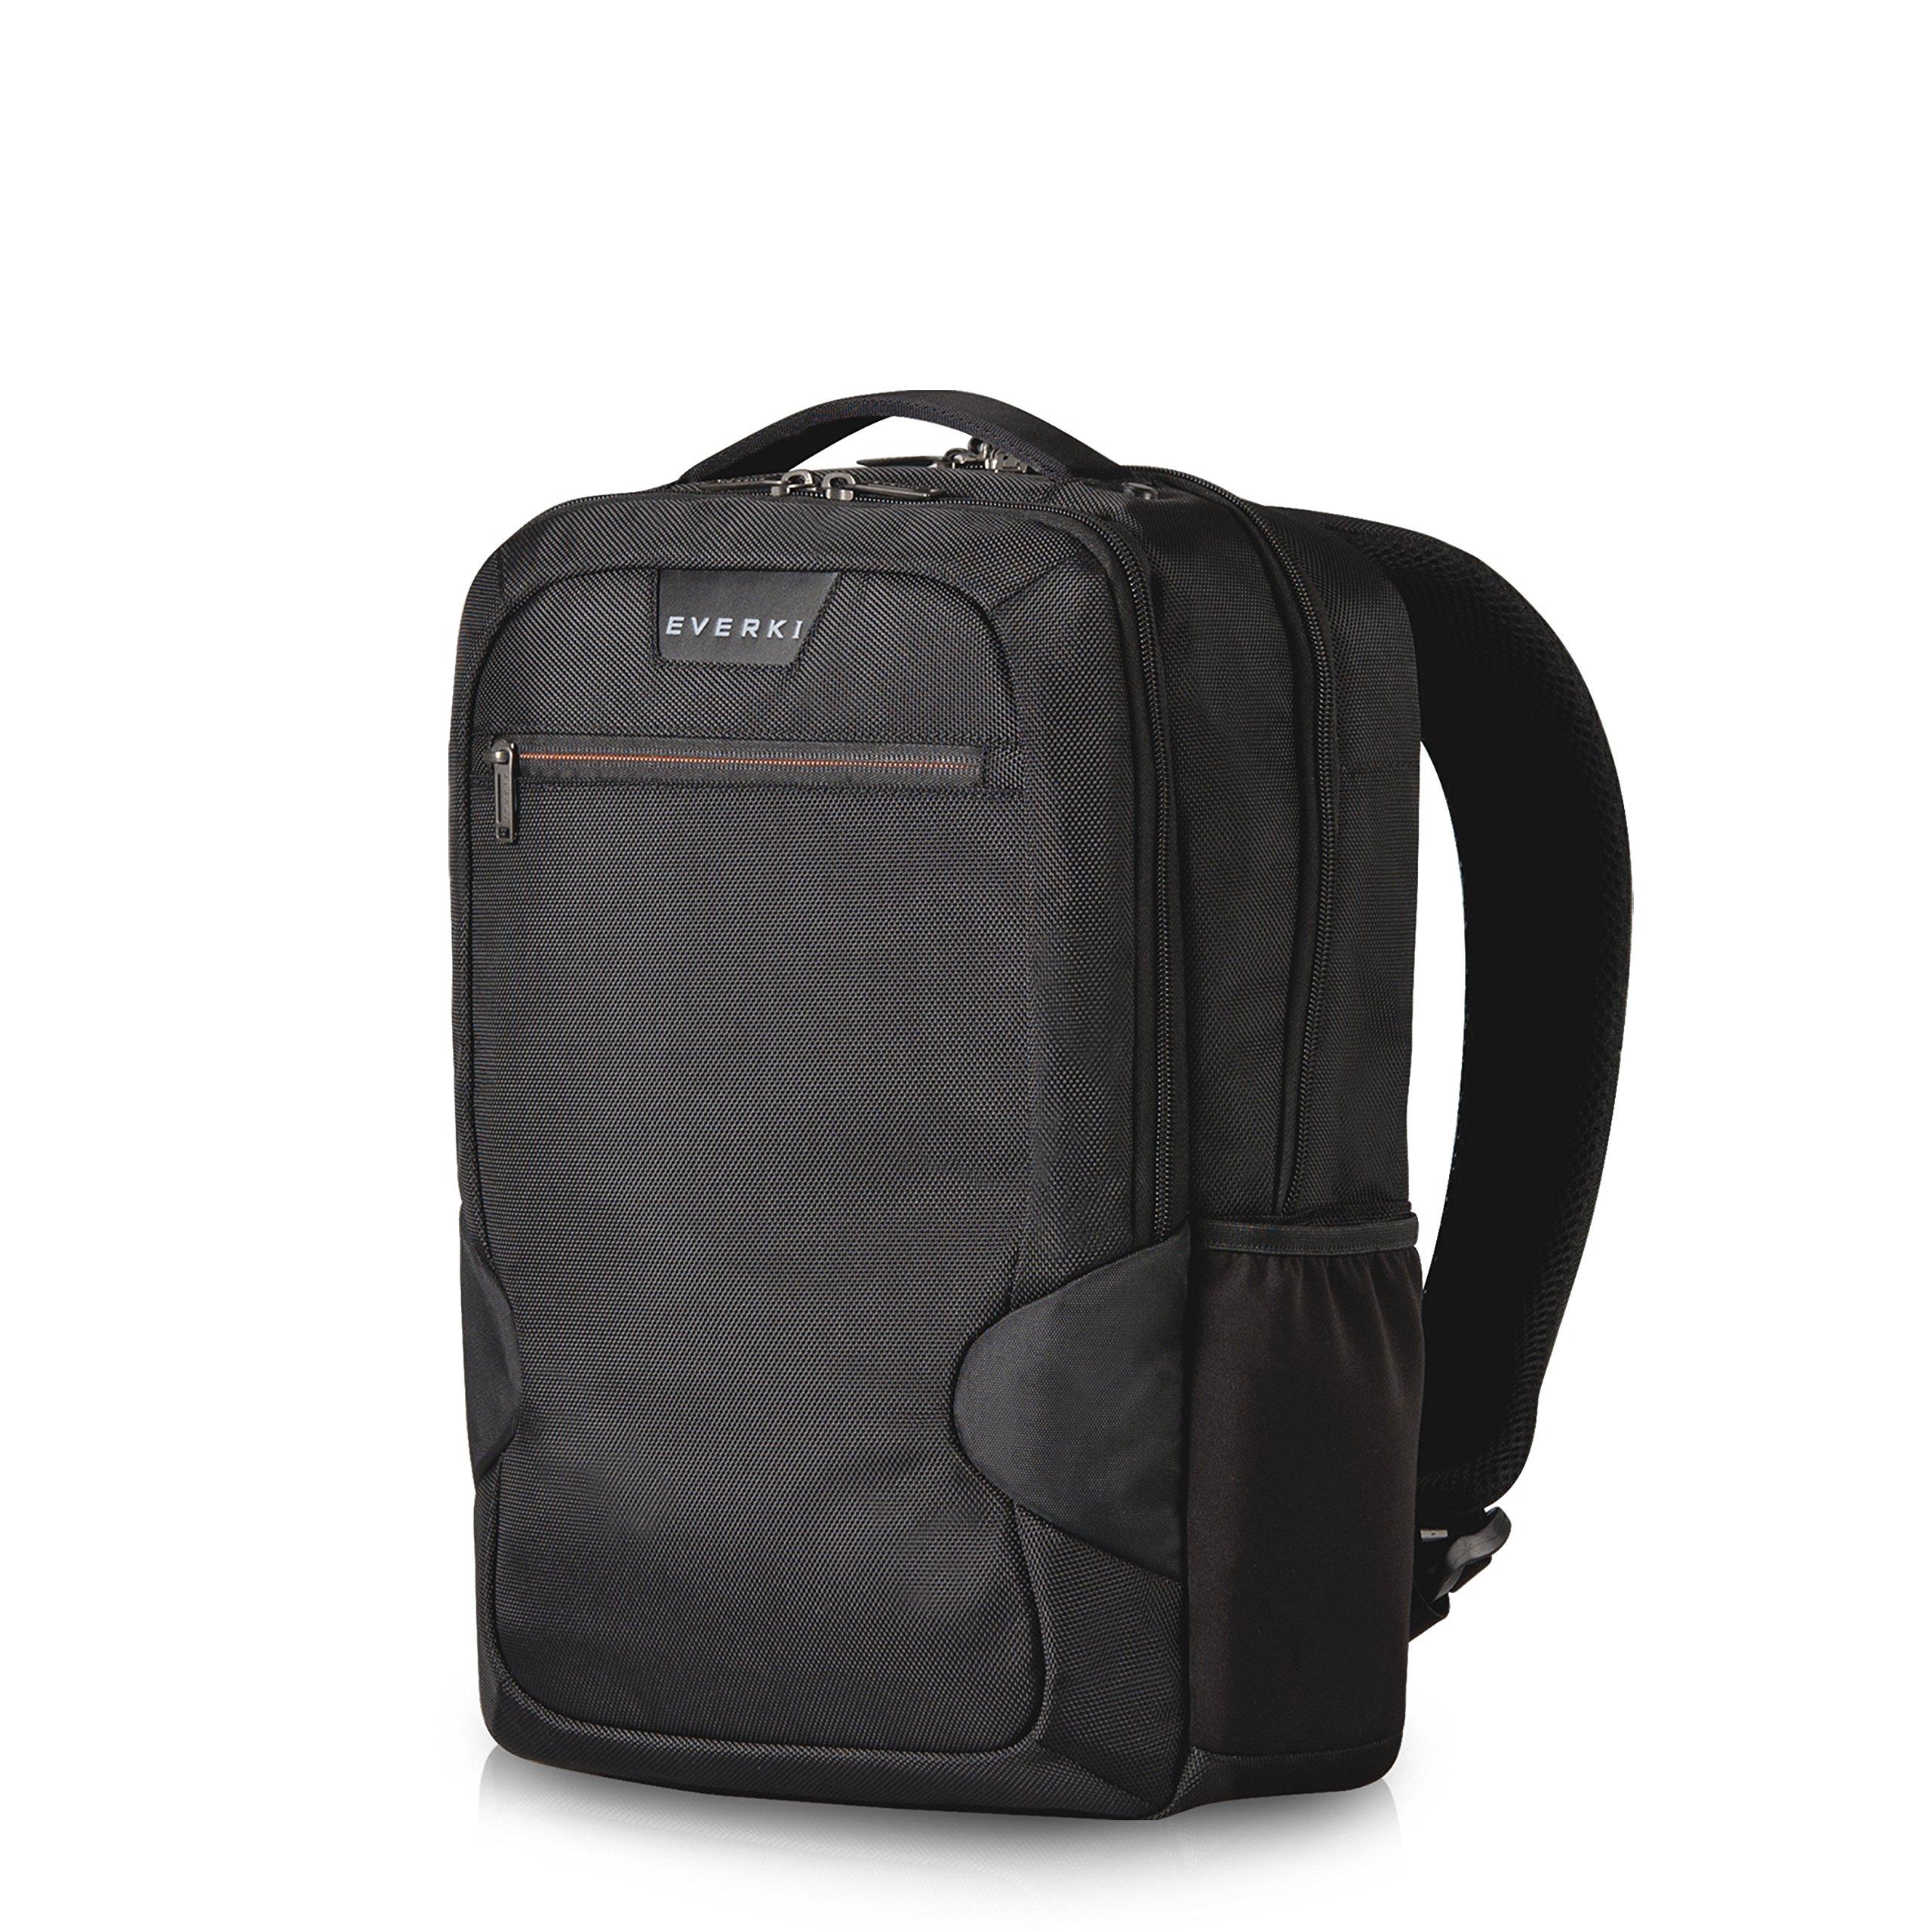 Everki Studio Slim Laptop Backpack for upto 14.1-Inch Laptops/15-Inch MacBook Pro (EKP118) by Everki (Image #3)